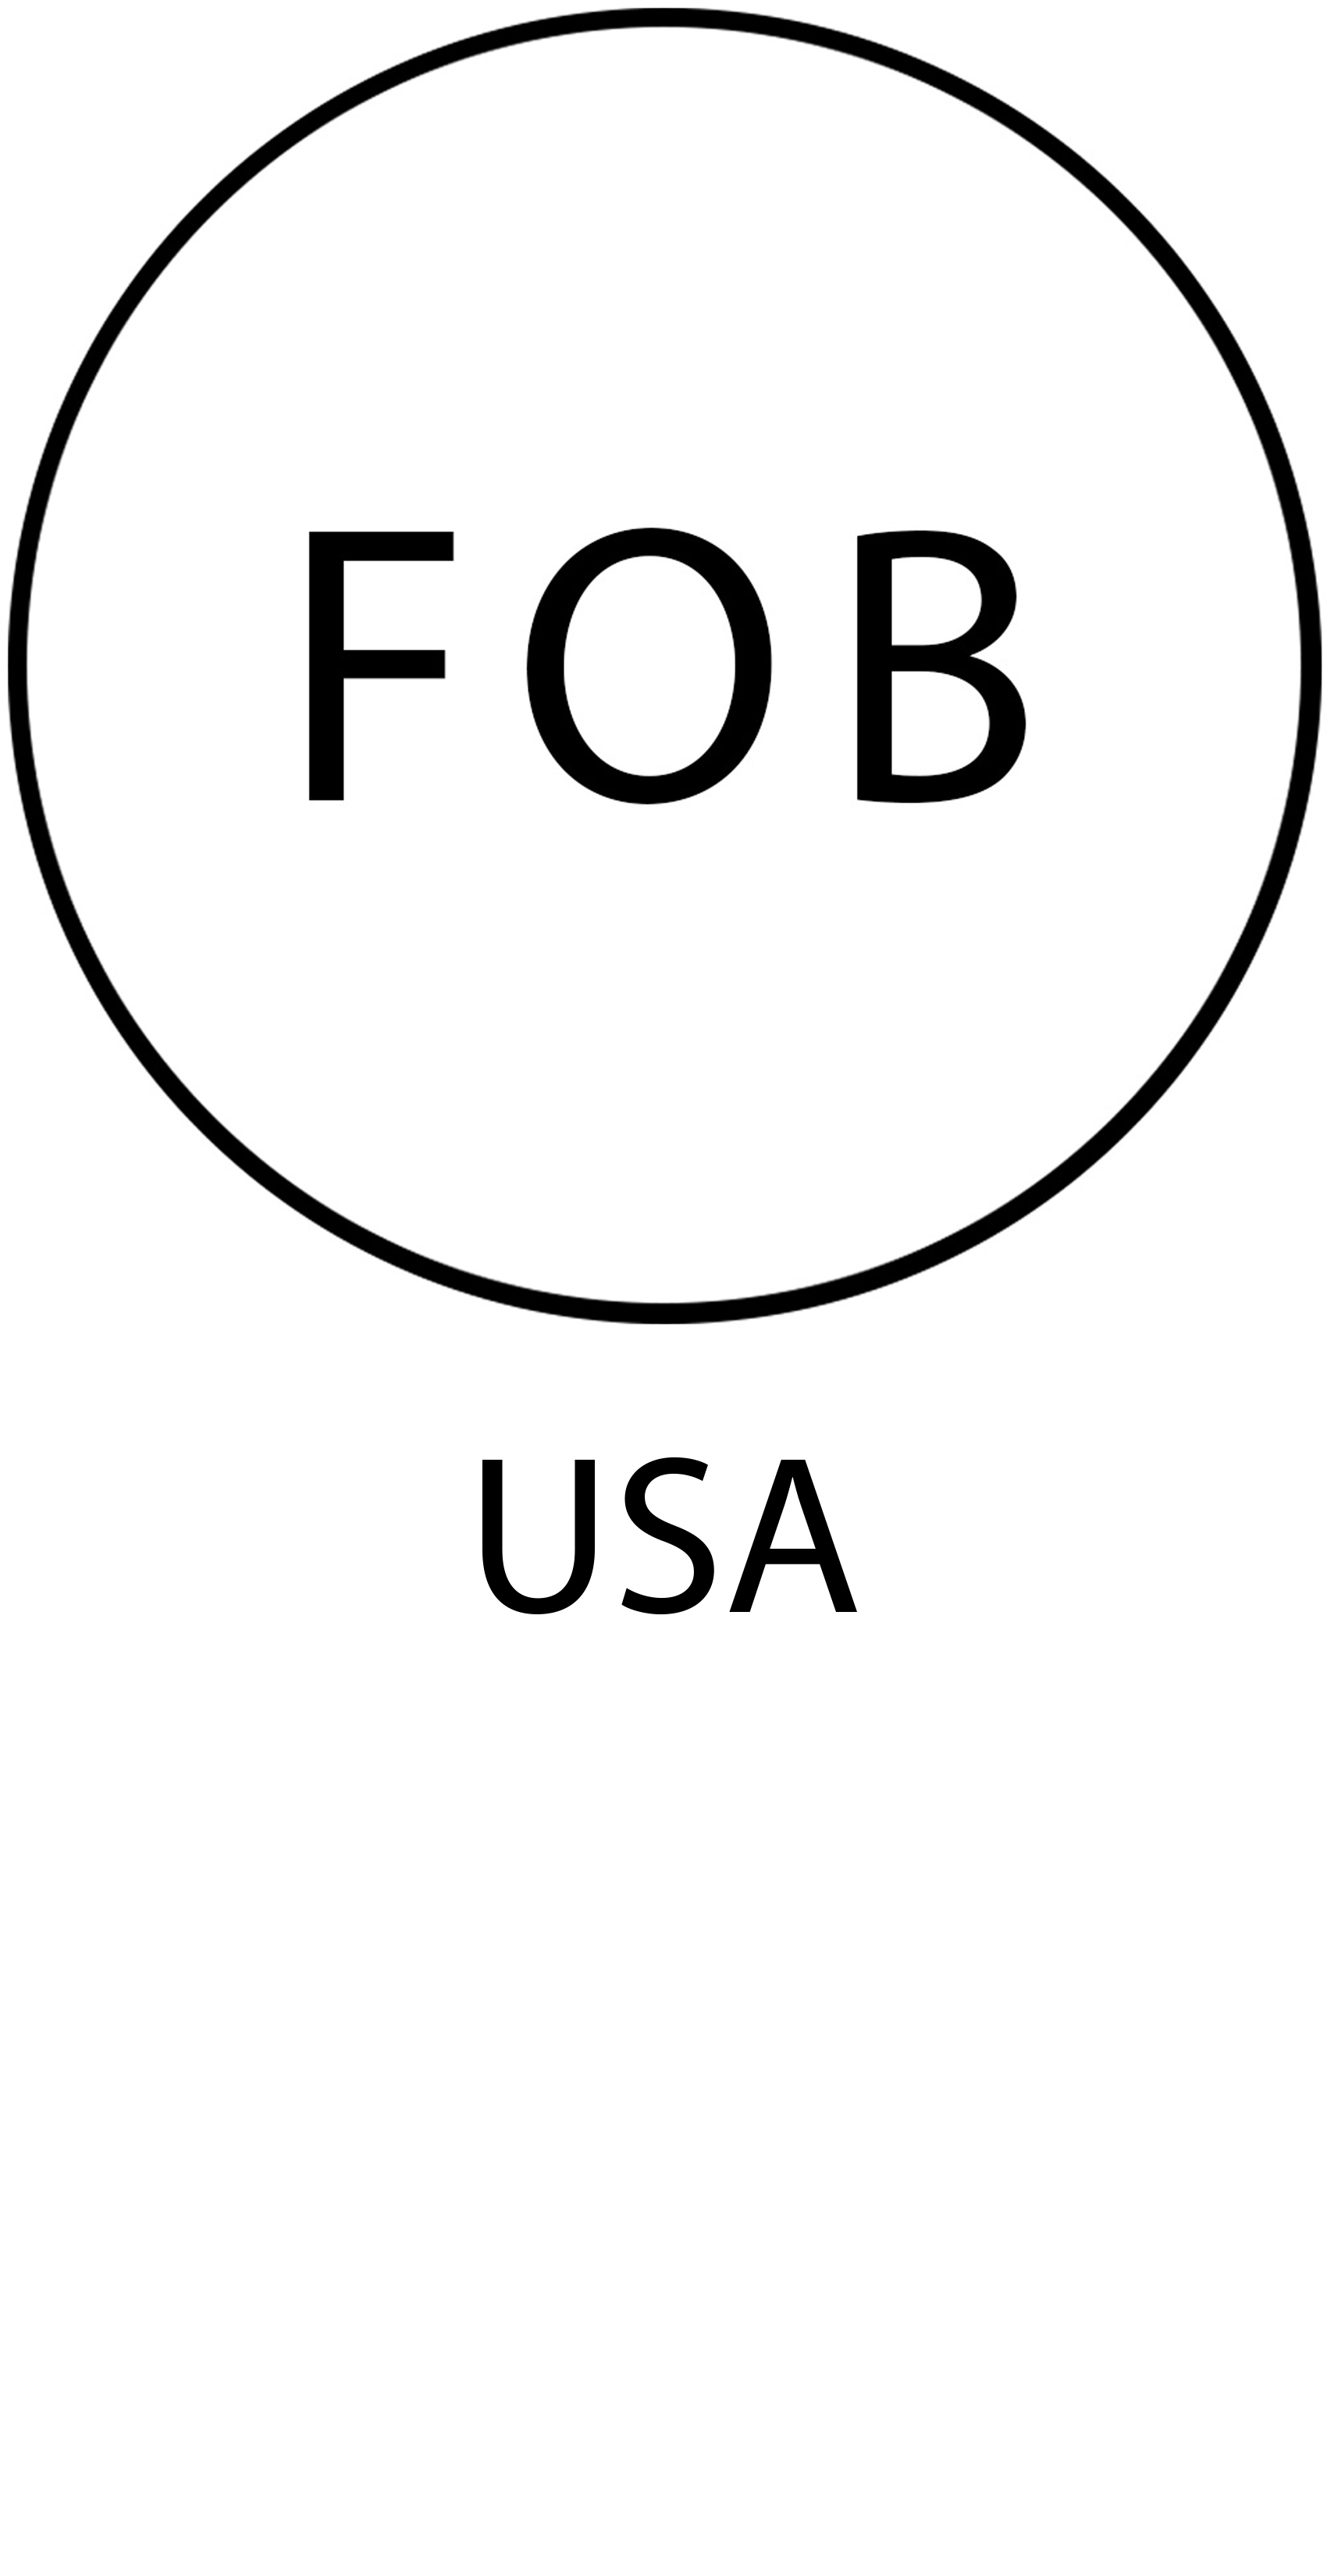 FOB_USA.jpg